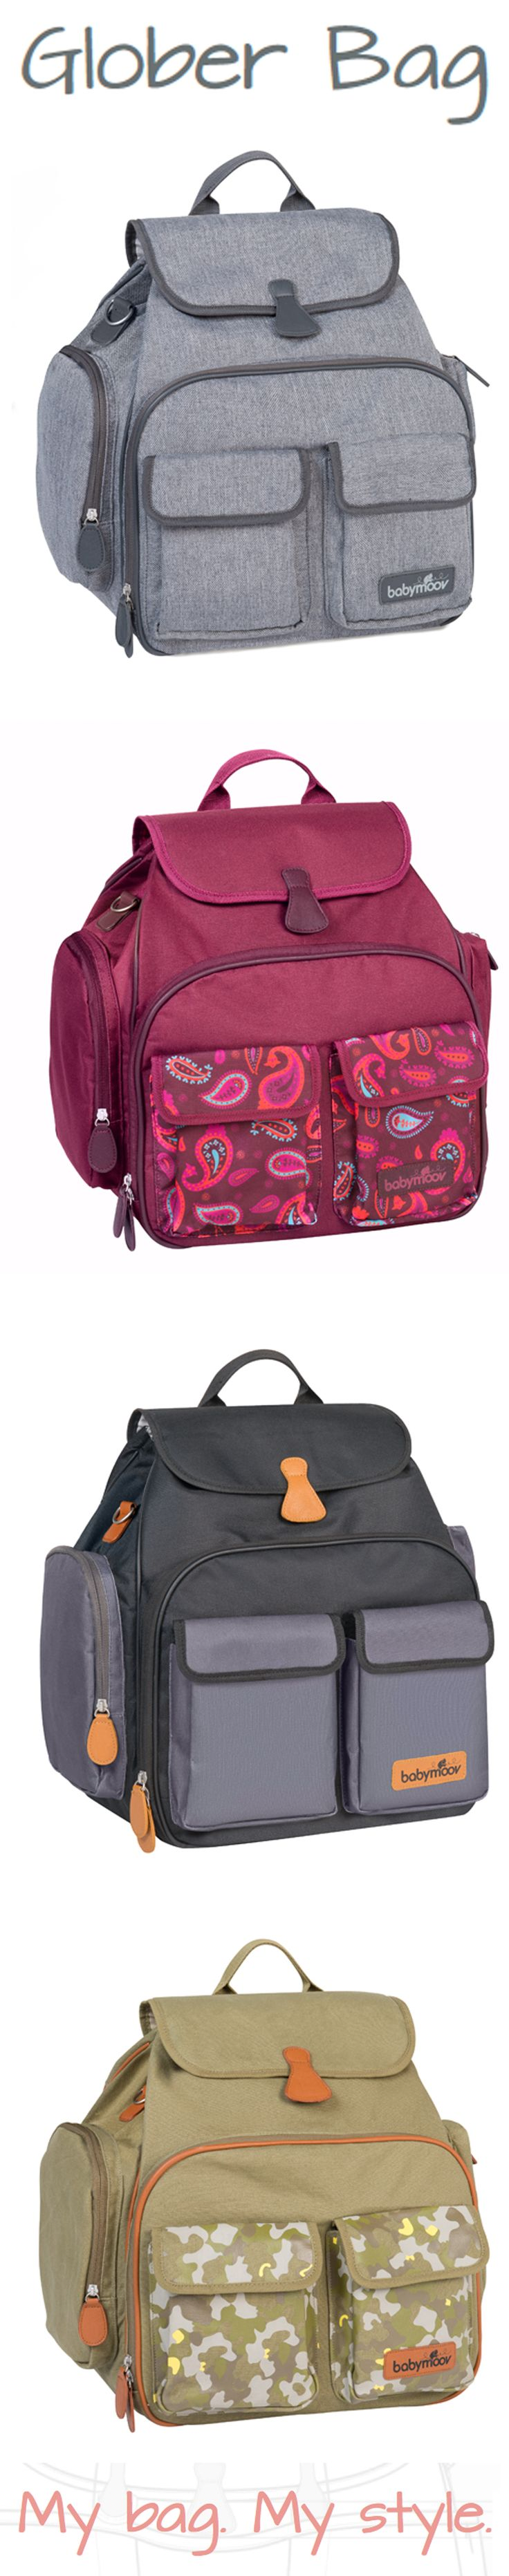 Glober Bag #adventure #backpack #street #mumanddad #Mybagmystyle #Babymoov